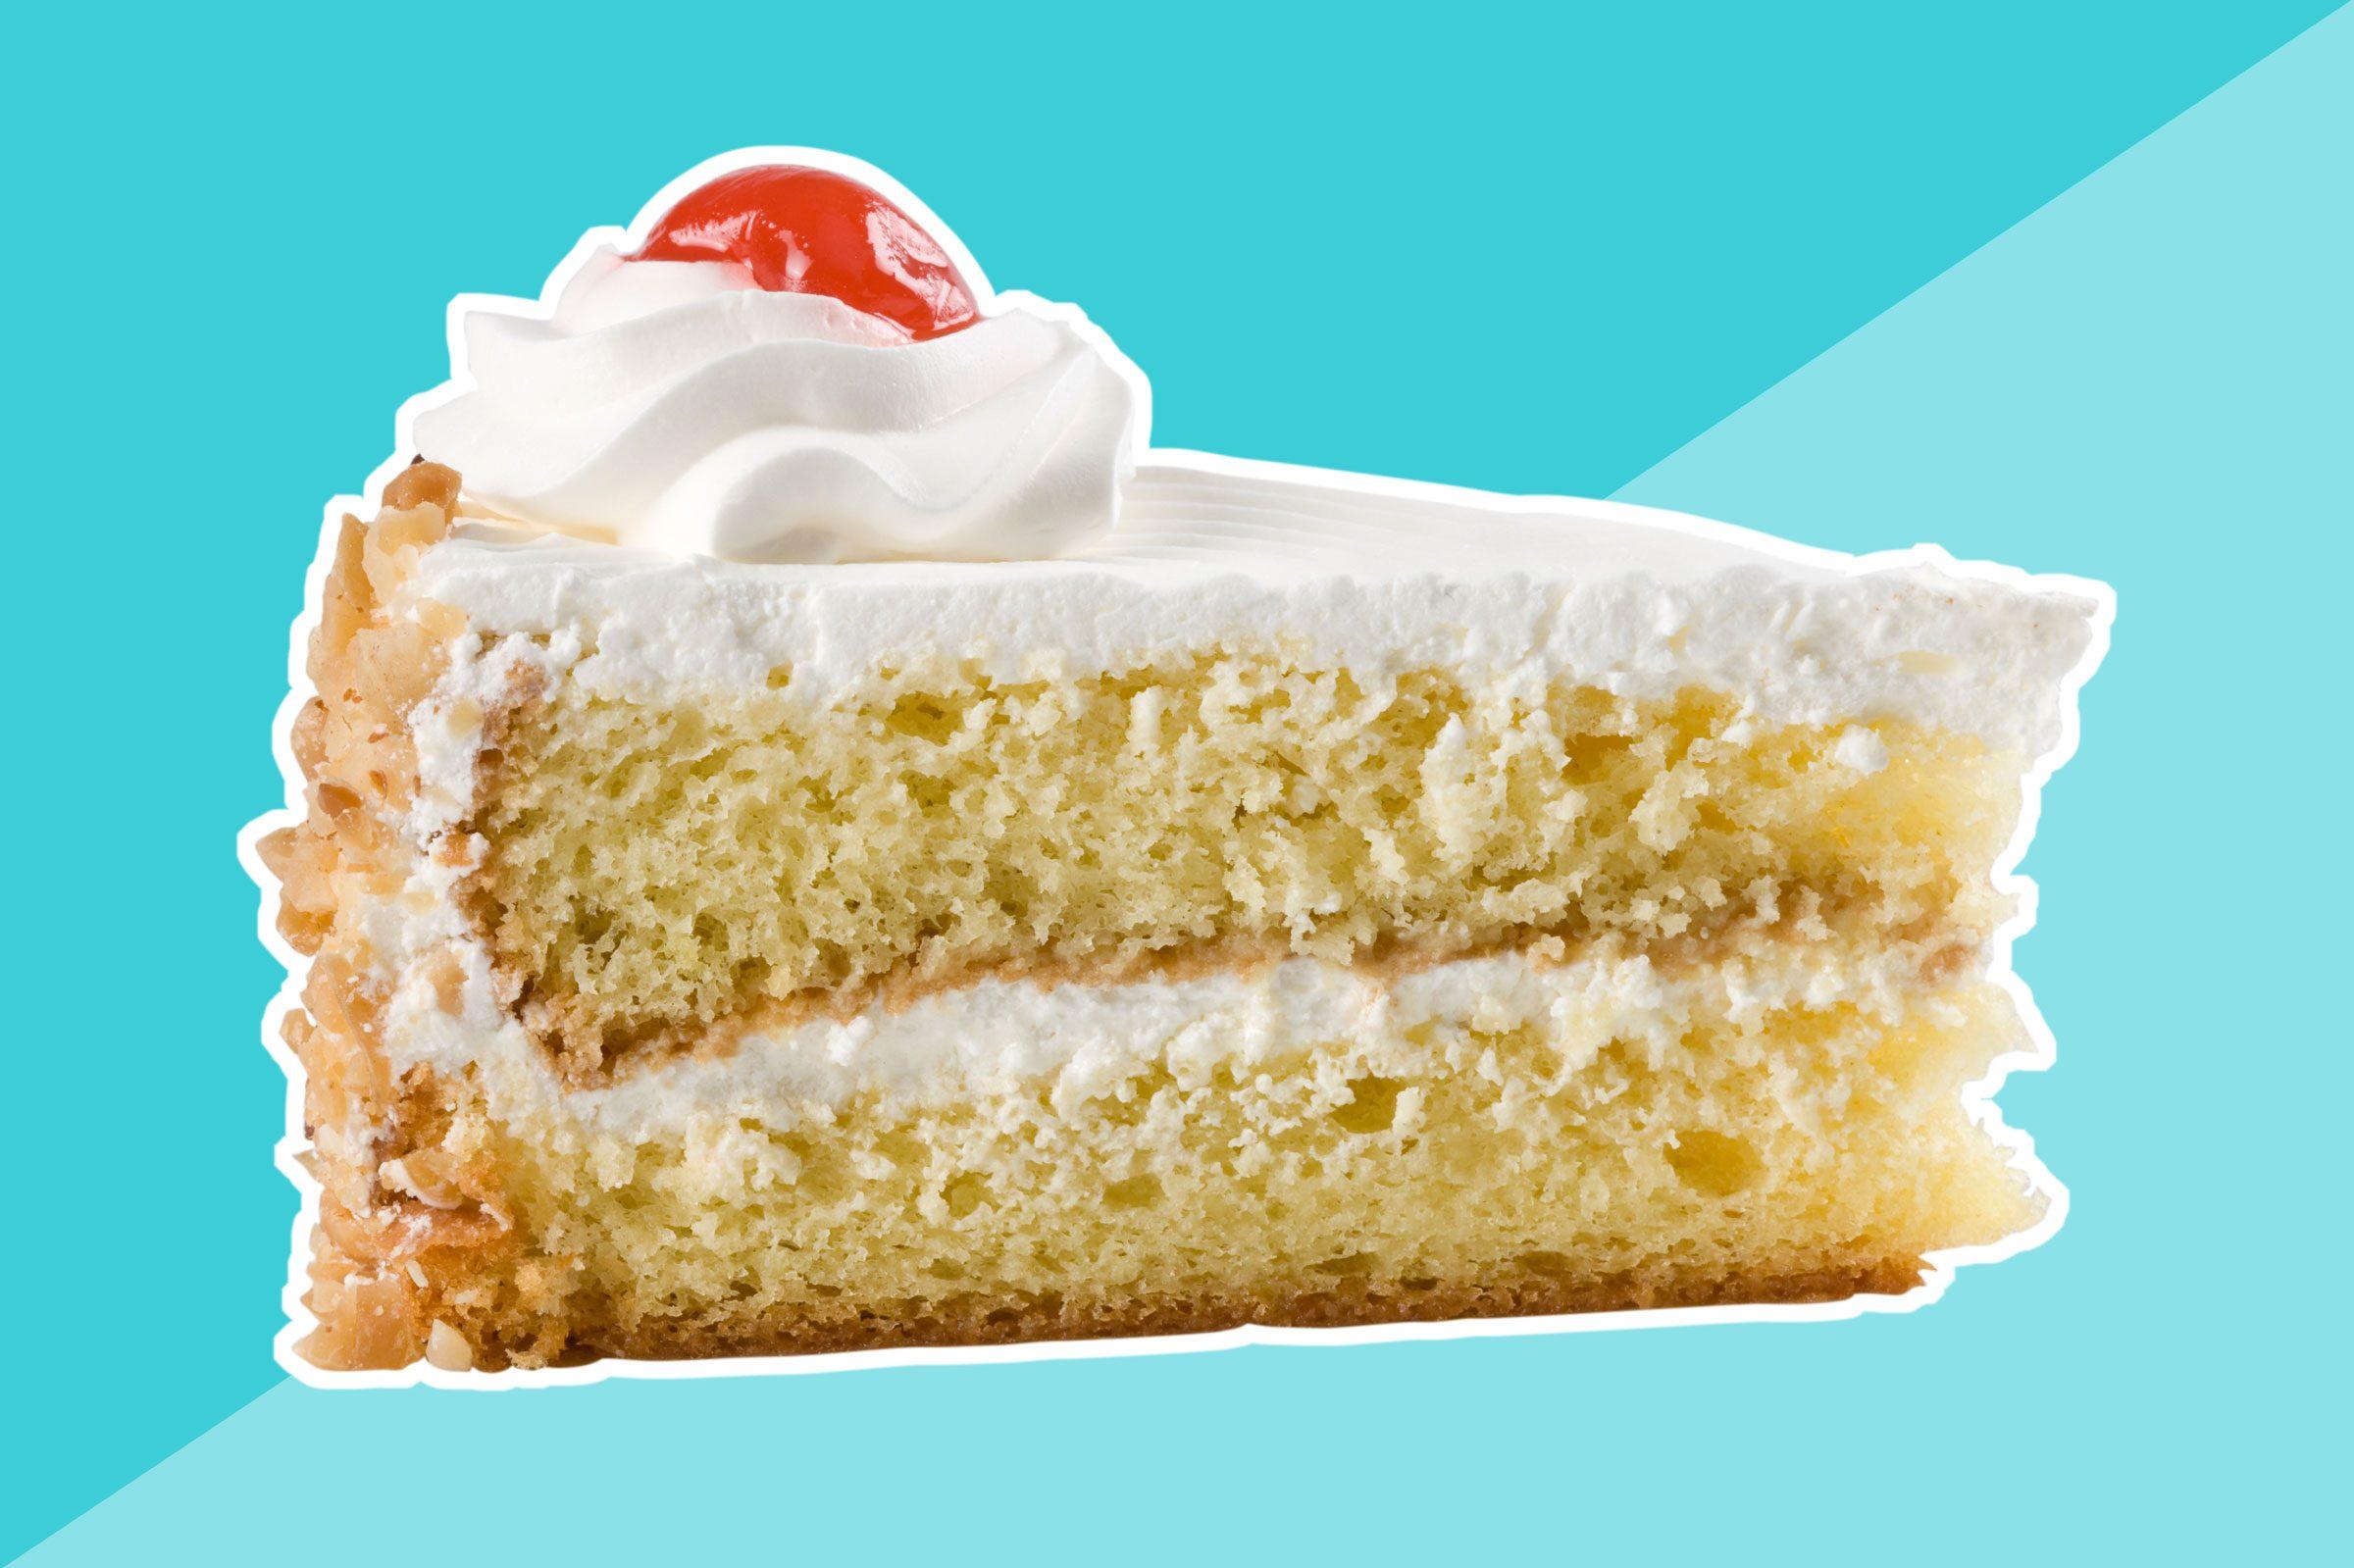 4. Cake